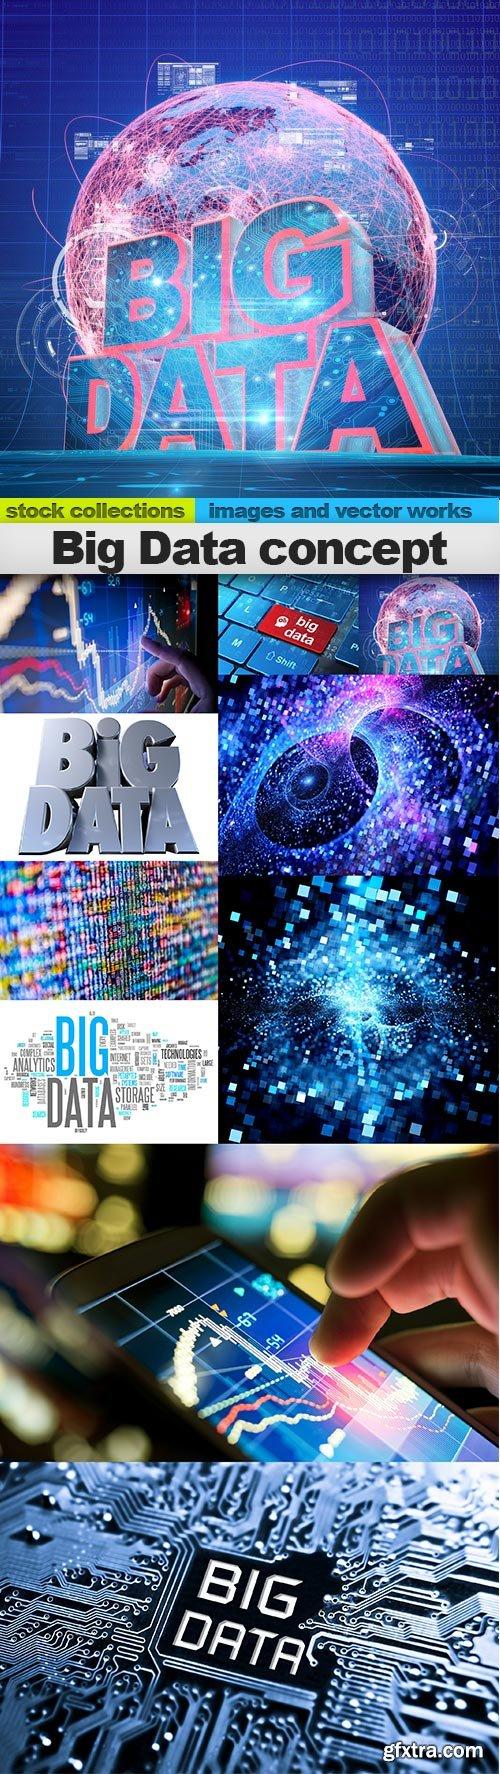 Big Data concept, 10 x UHQ JPEG